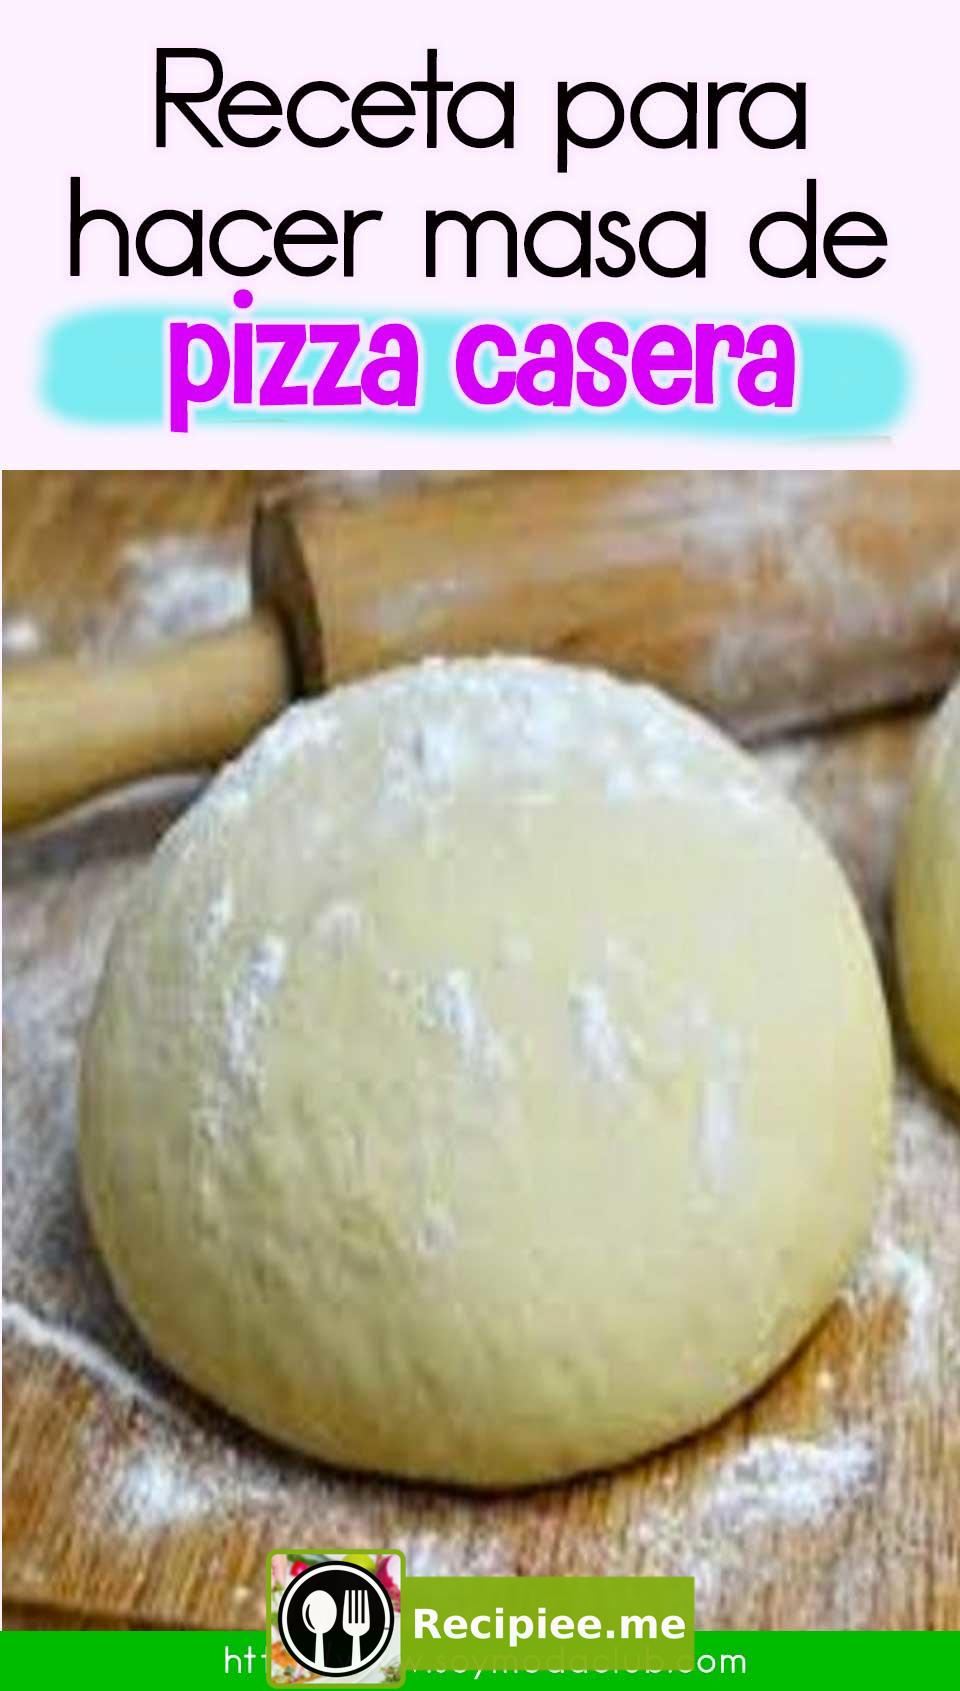 Receta Para Hacer Masa De Pizza Casera Casera De Hacer Masa Para Pizza Receta Masa De Pizza Casera Pizza Casera Masa Para Pizza